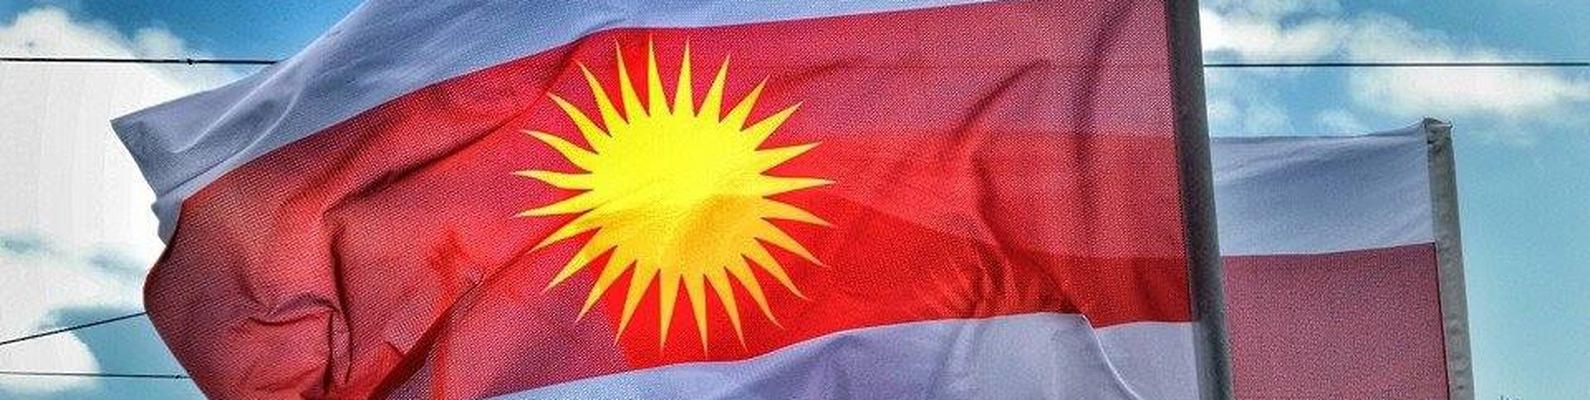 целом езидский флаг фото знаете, ведь меня